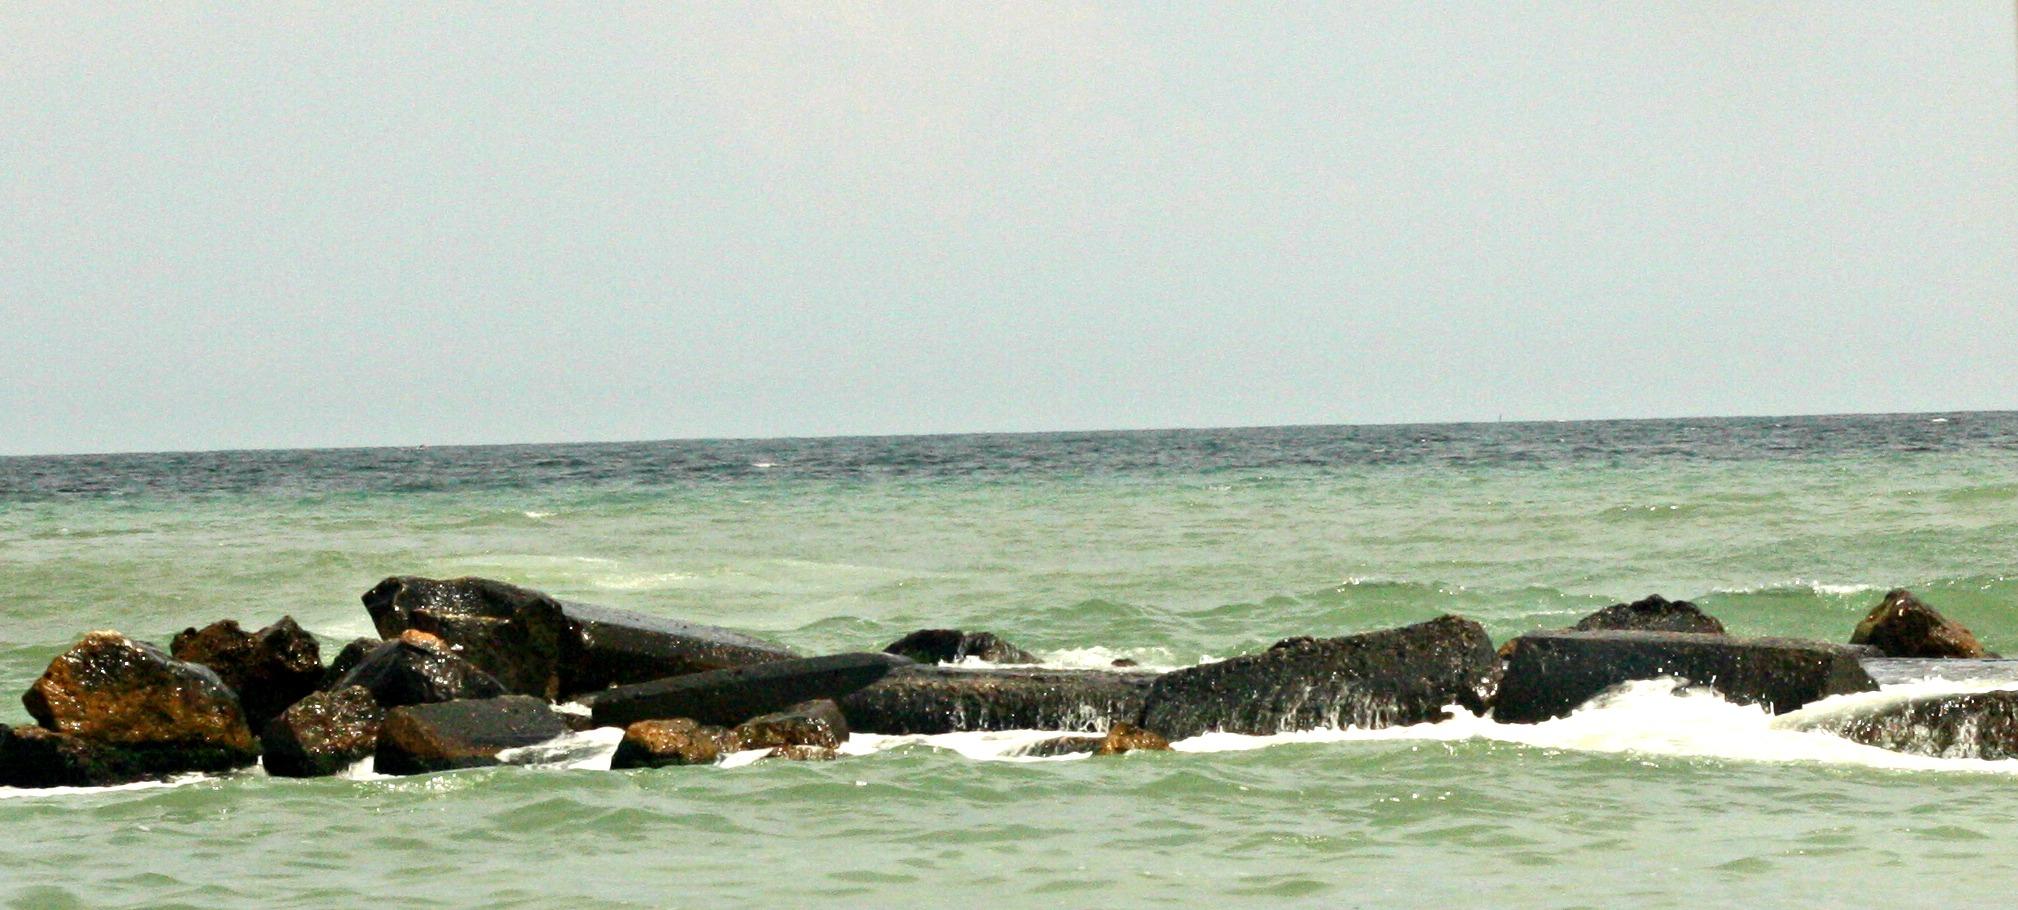 Eforie Nord #seaside #romania #romanian #holiday #beach